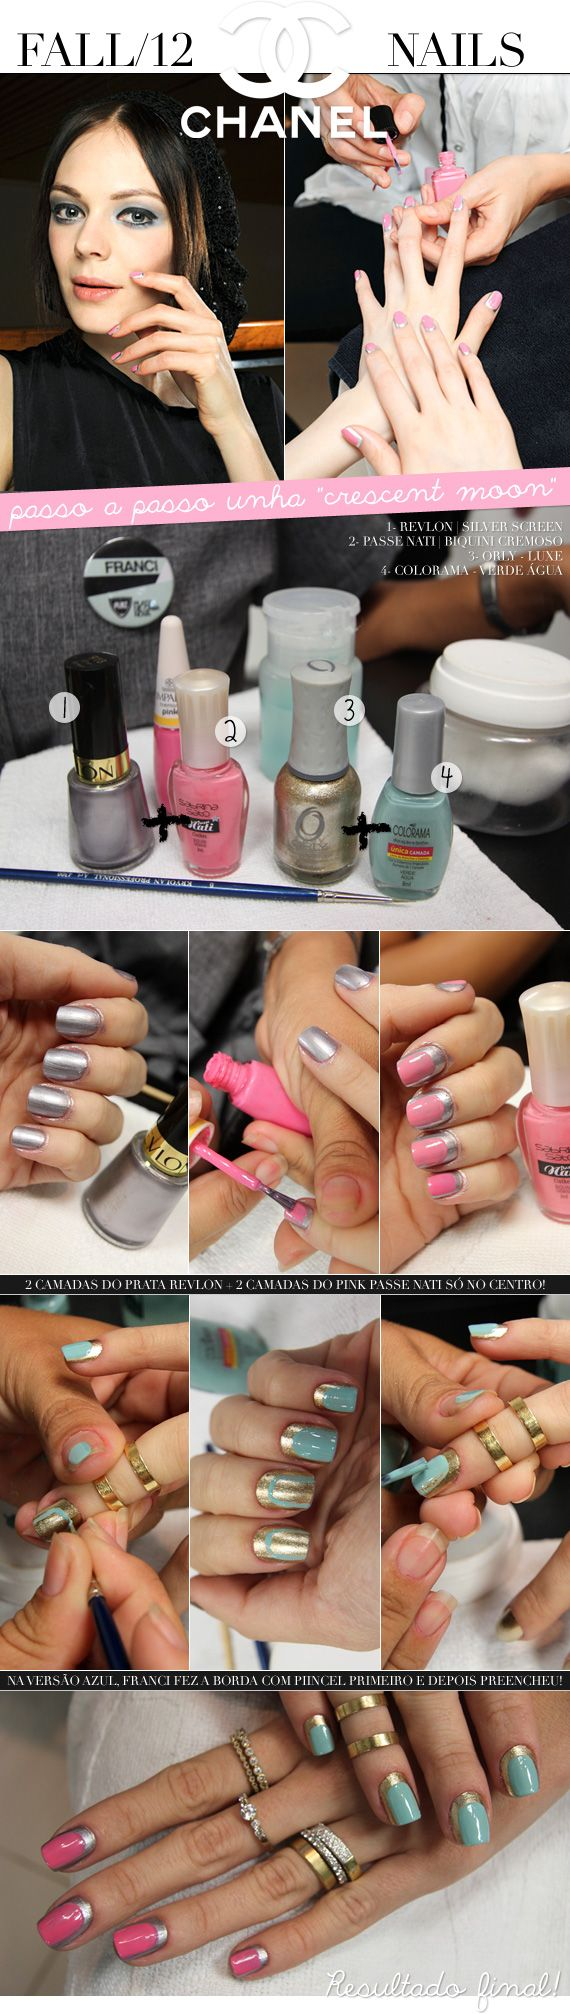 nails-chanel-fall-2012